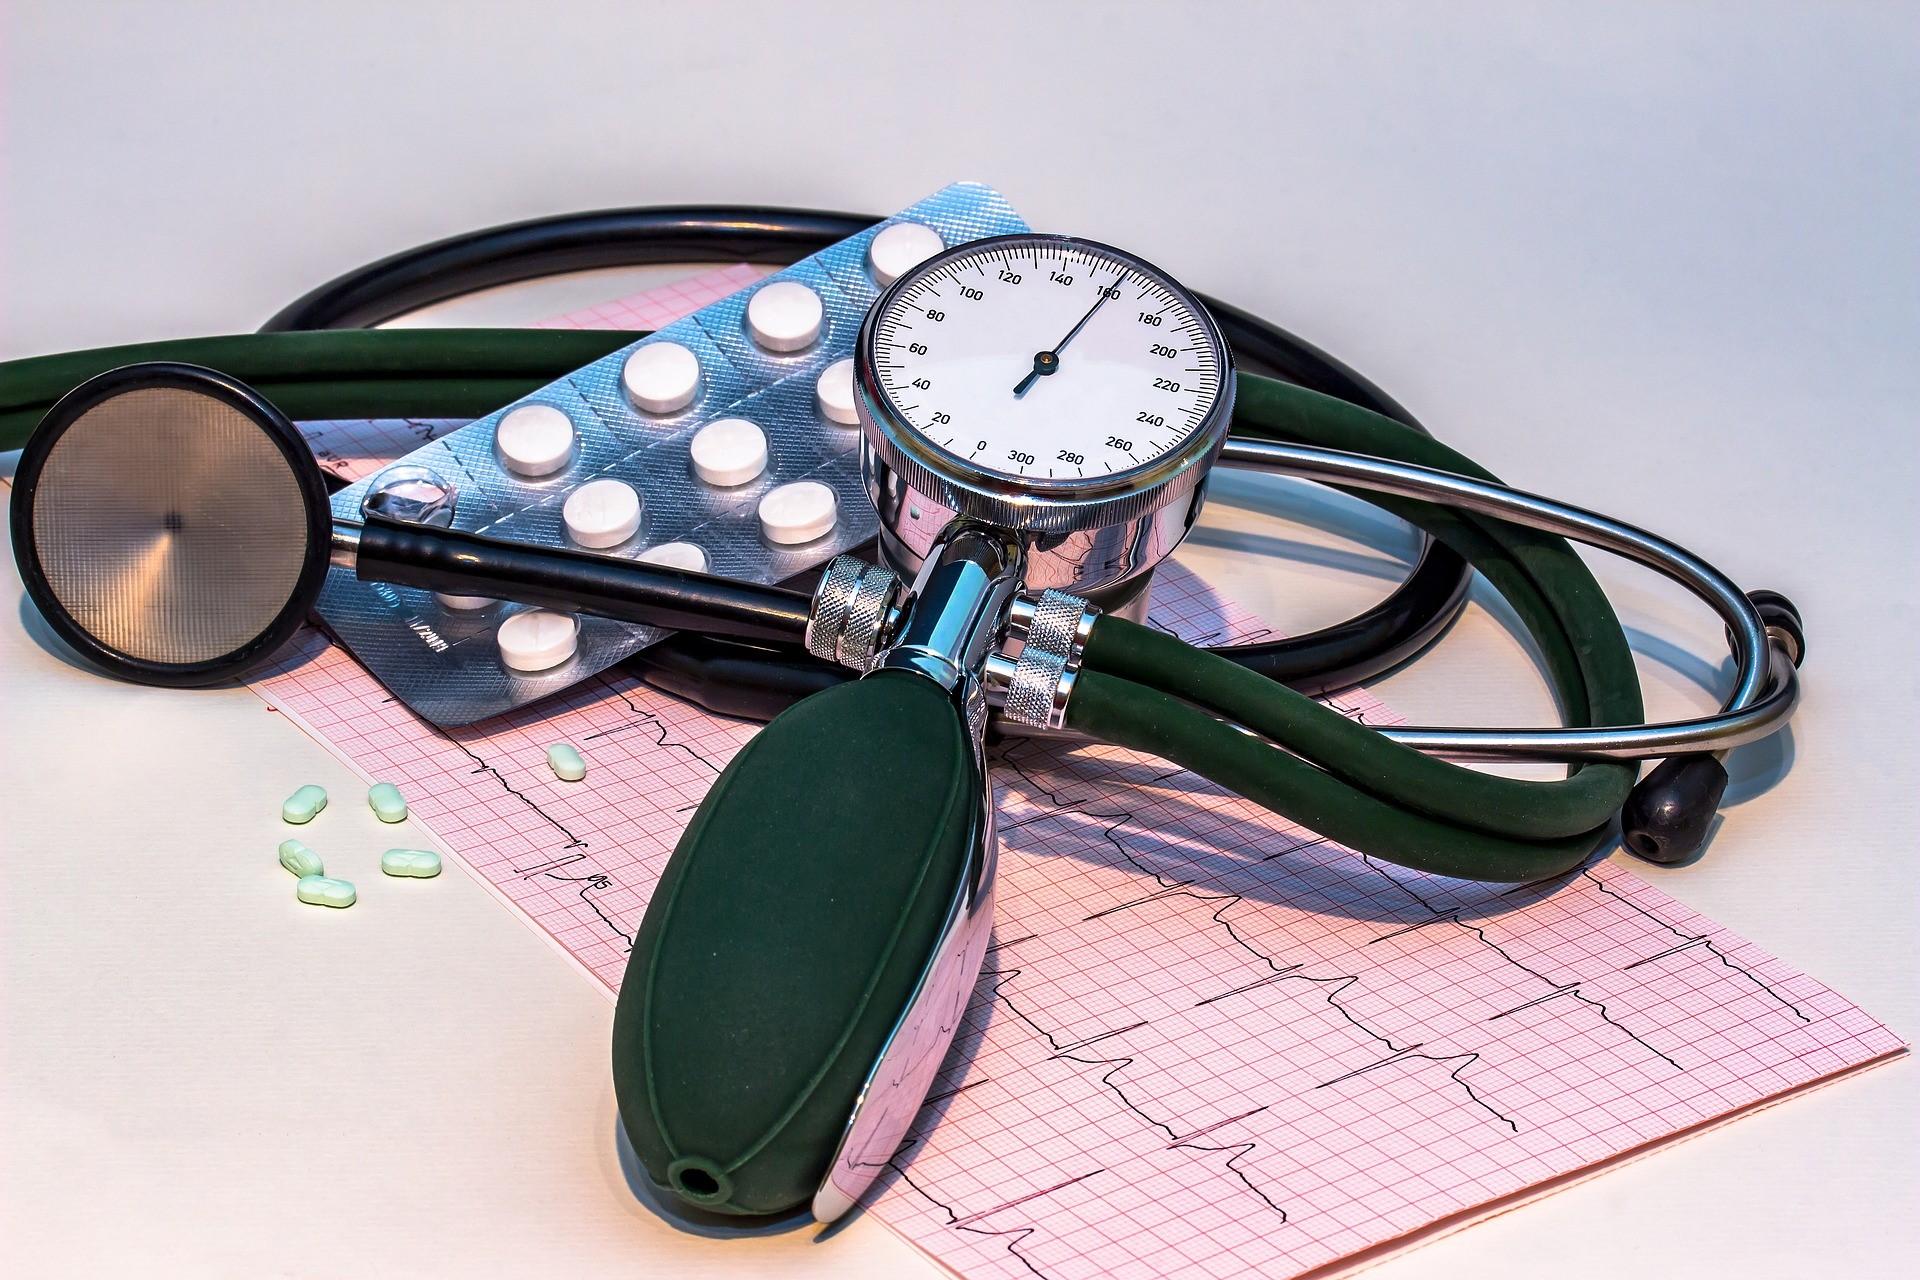 Kandesartanas – pažangus vaistas hipertenzijai gydyti | jusukalve.lt